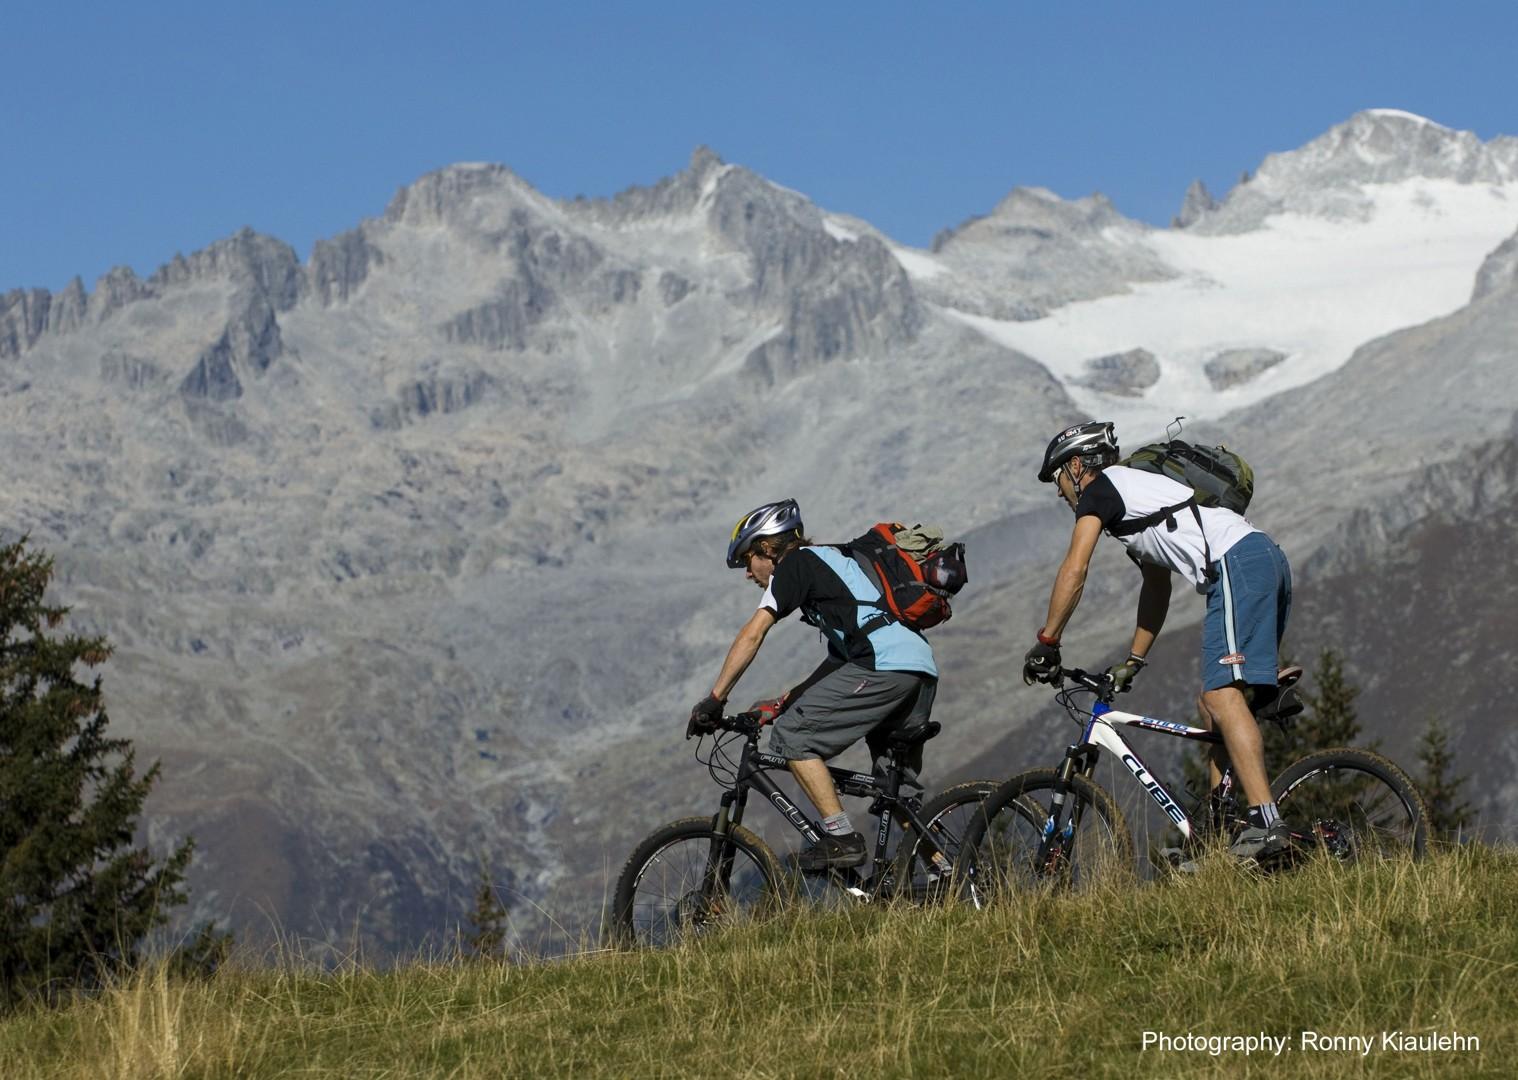 dolomites5.jpg - Italy - Dolomites of Brenta - Guided Mountain Bike Holiday - Mountain Biking